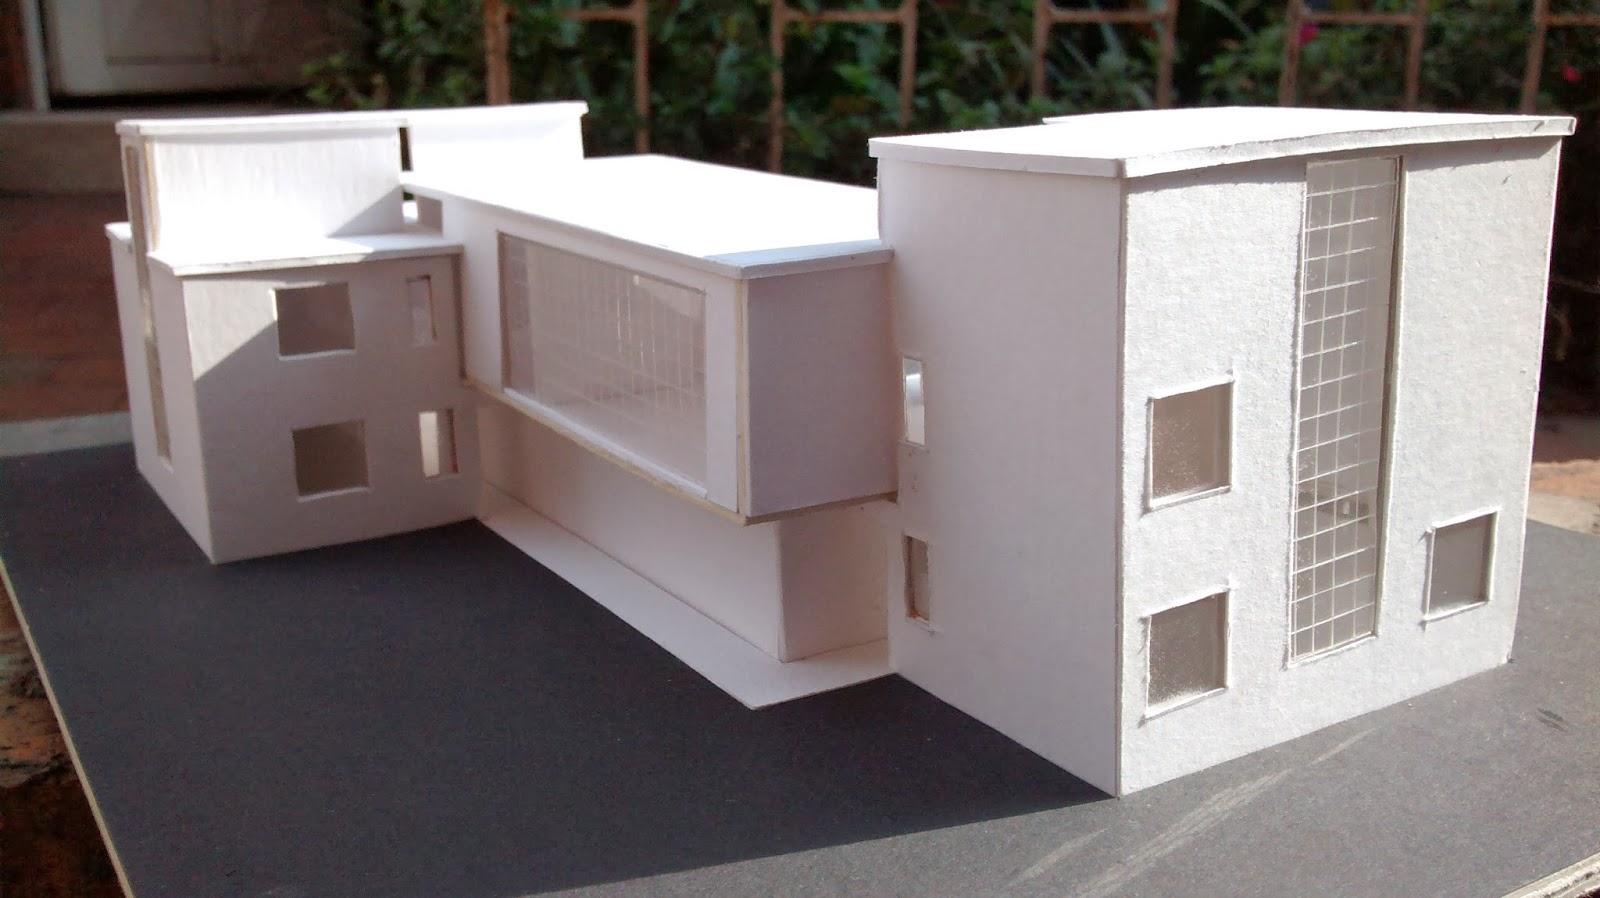 Historia de la arquitectura moderna walter gropius for Casa moderna maqueta